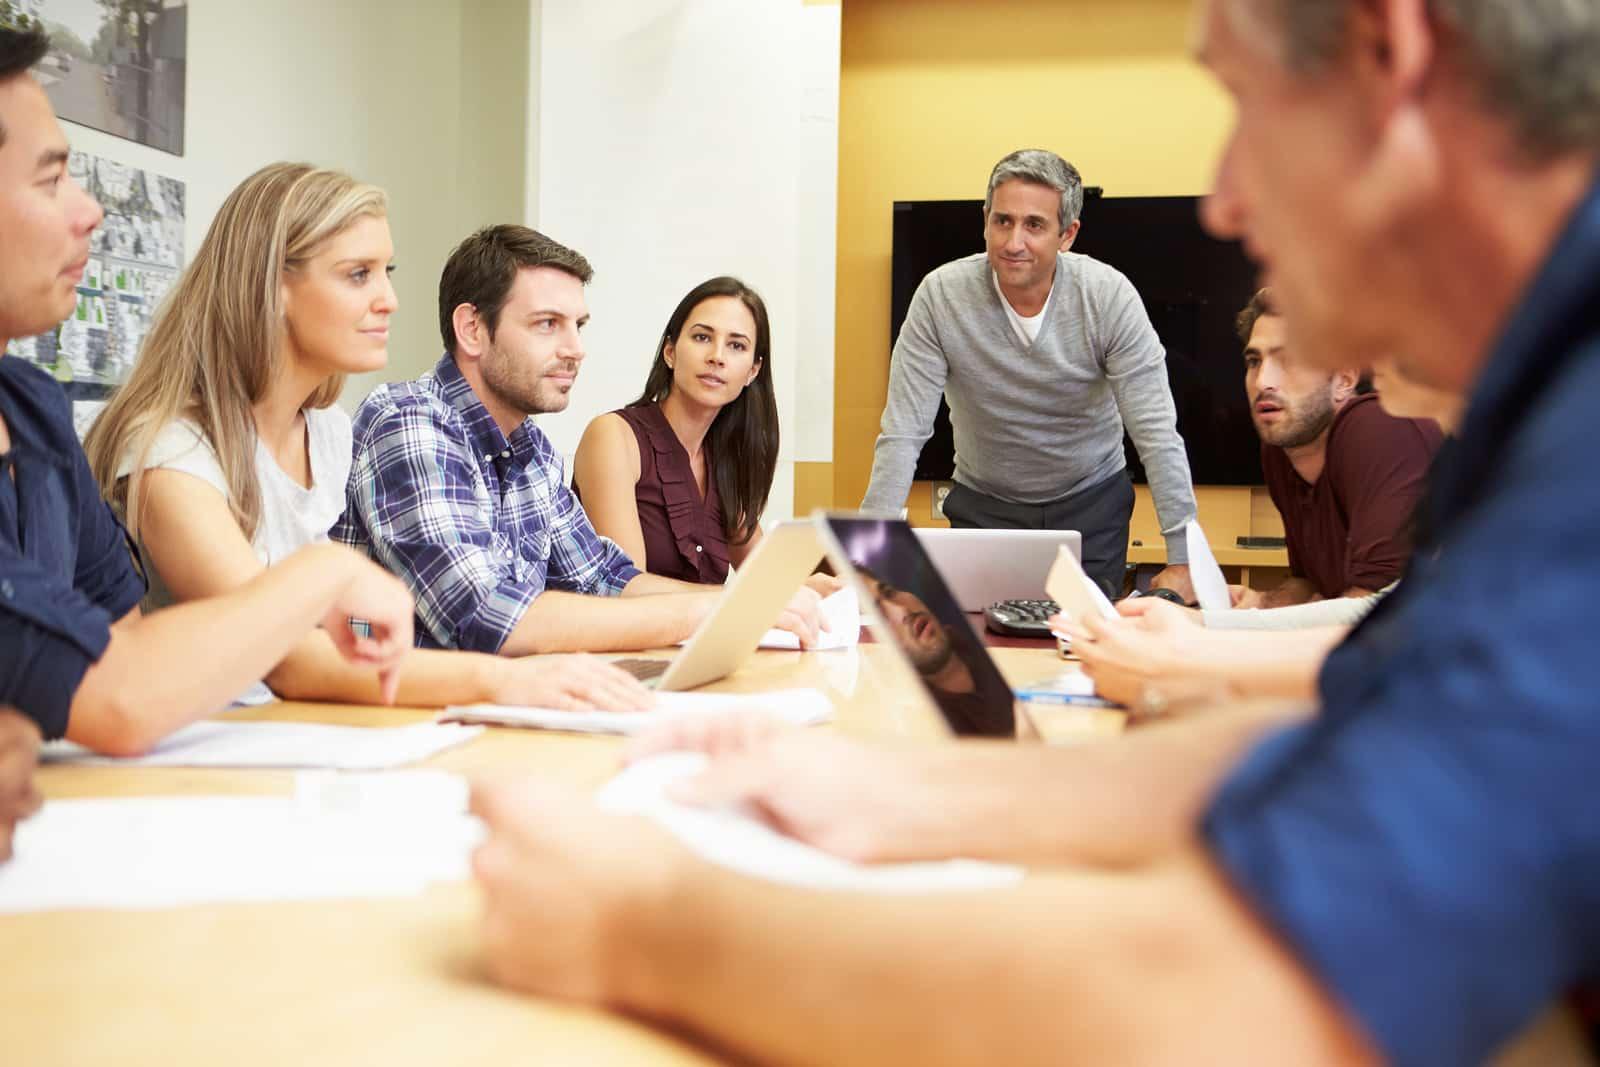 group- discuss